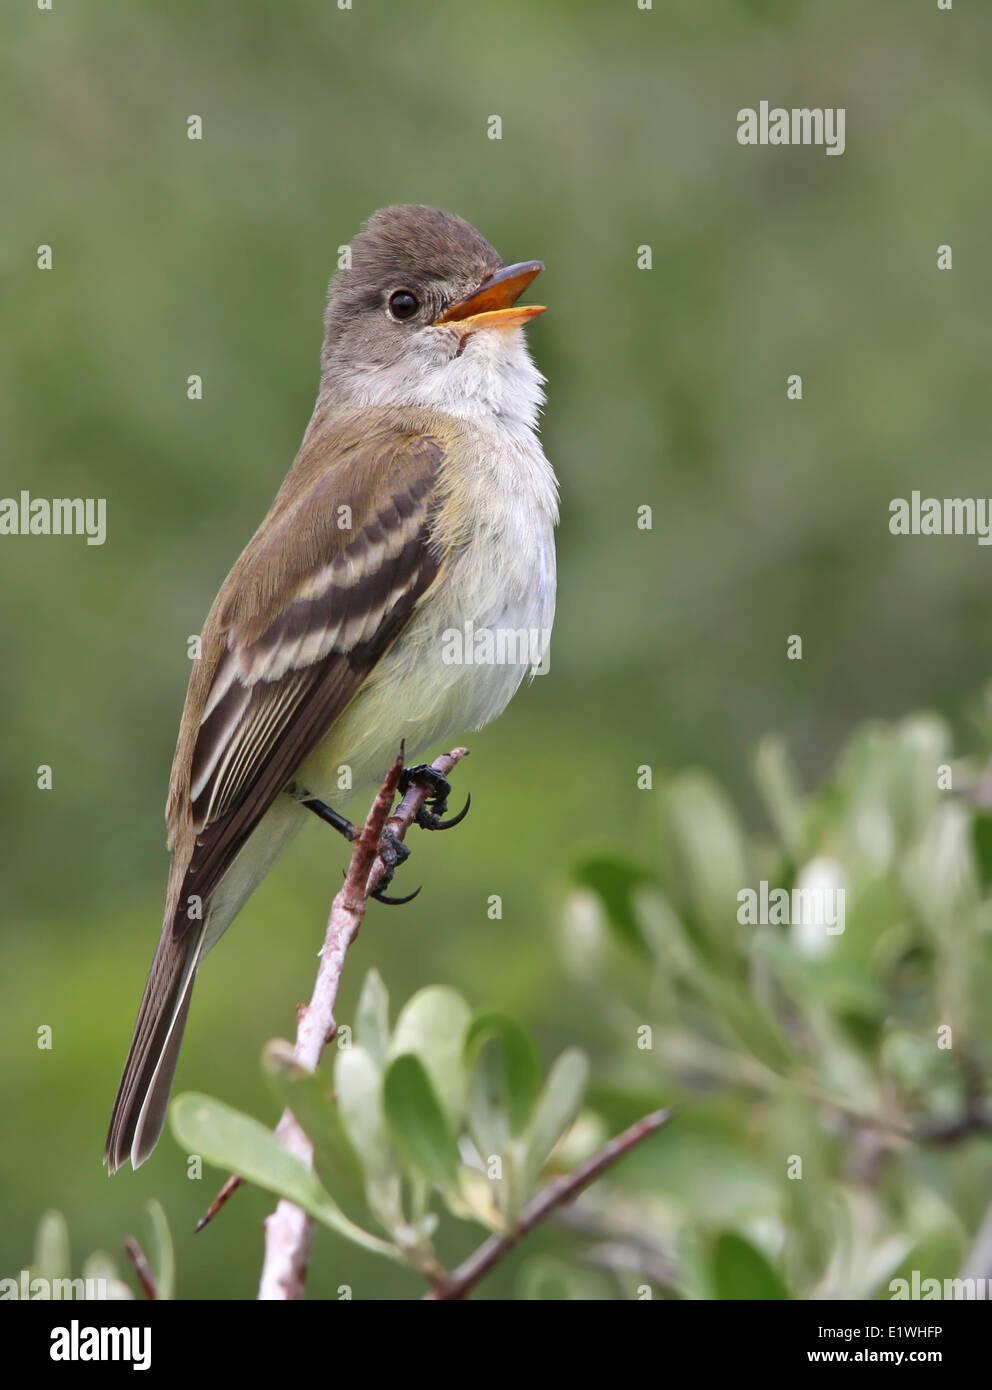 A Willow Flycatcher, Empidonax traillii, sings from wolf willow at Saskatchewan Landing Provincial Park, Saskatchewan - Stock Image